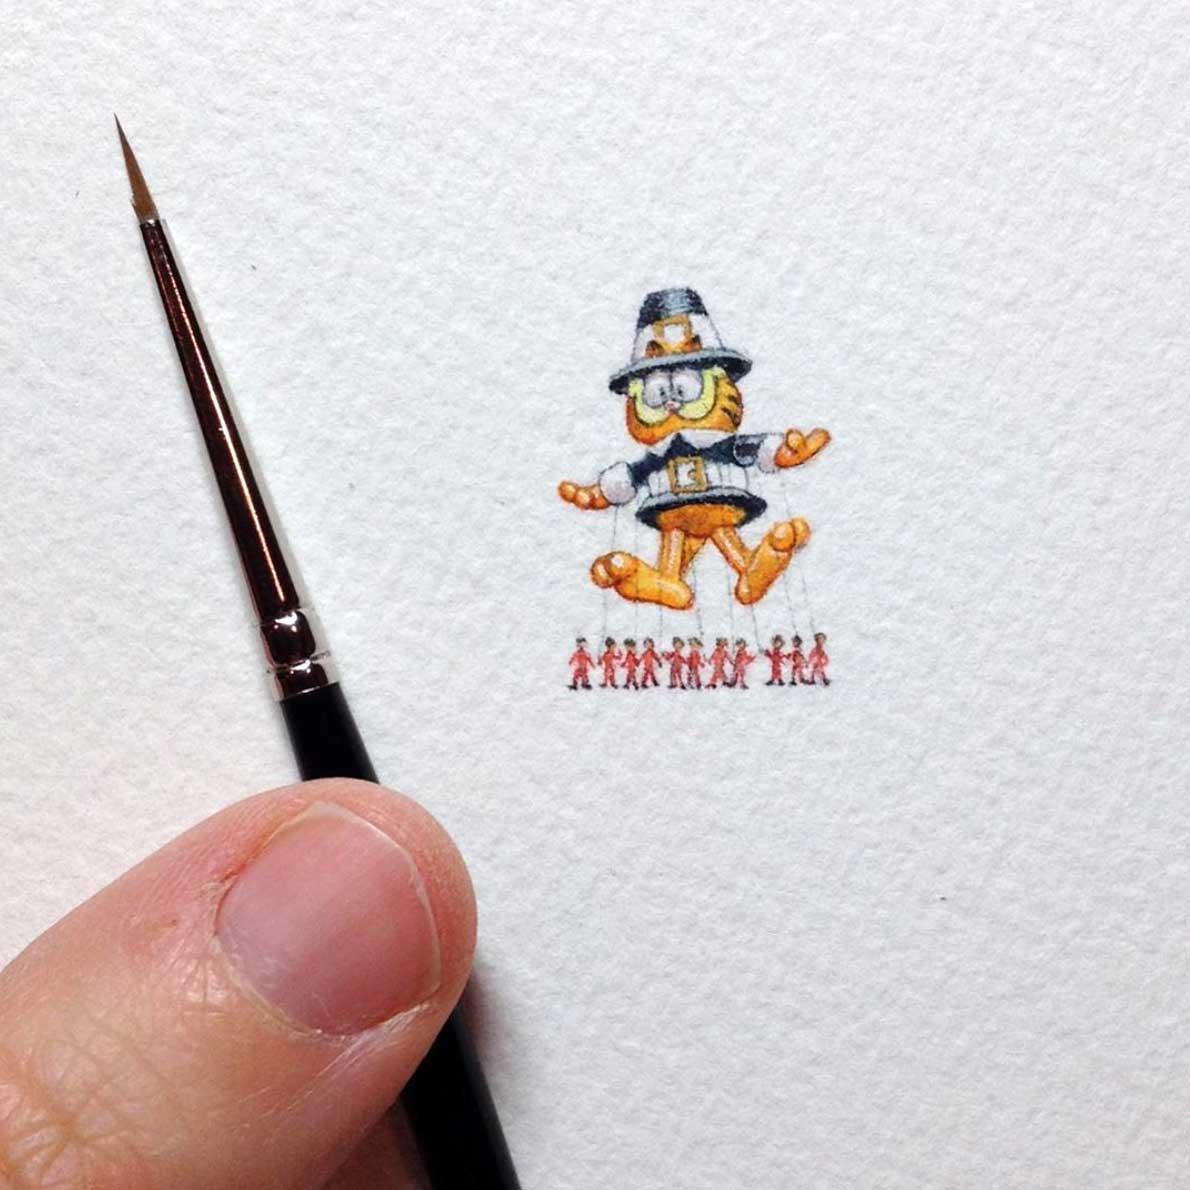 Miniatur-Gemälde von Brooke Rothshank Brooke-Rothshank-miniatur-malerei_04